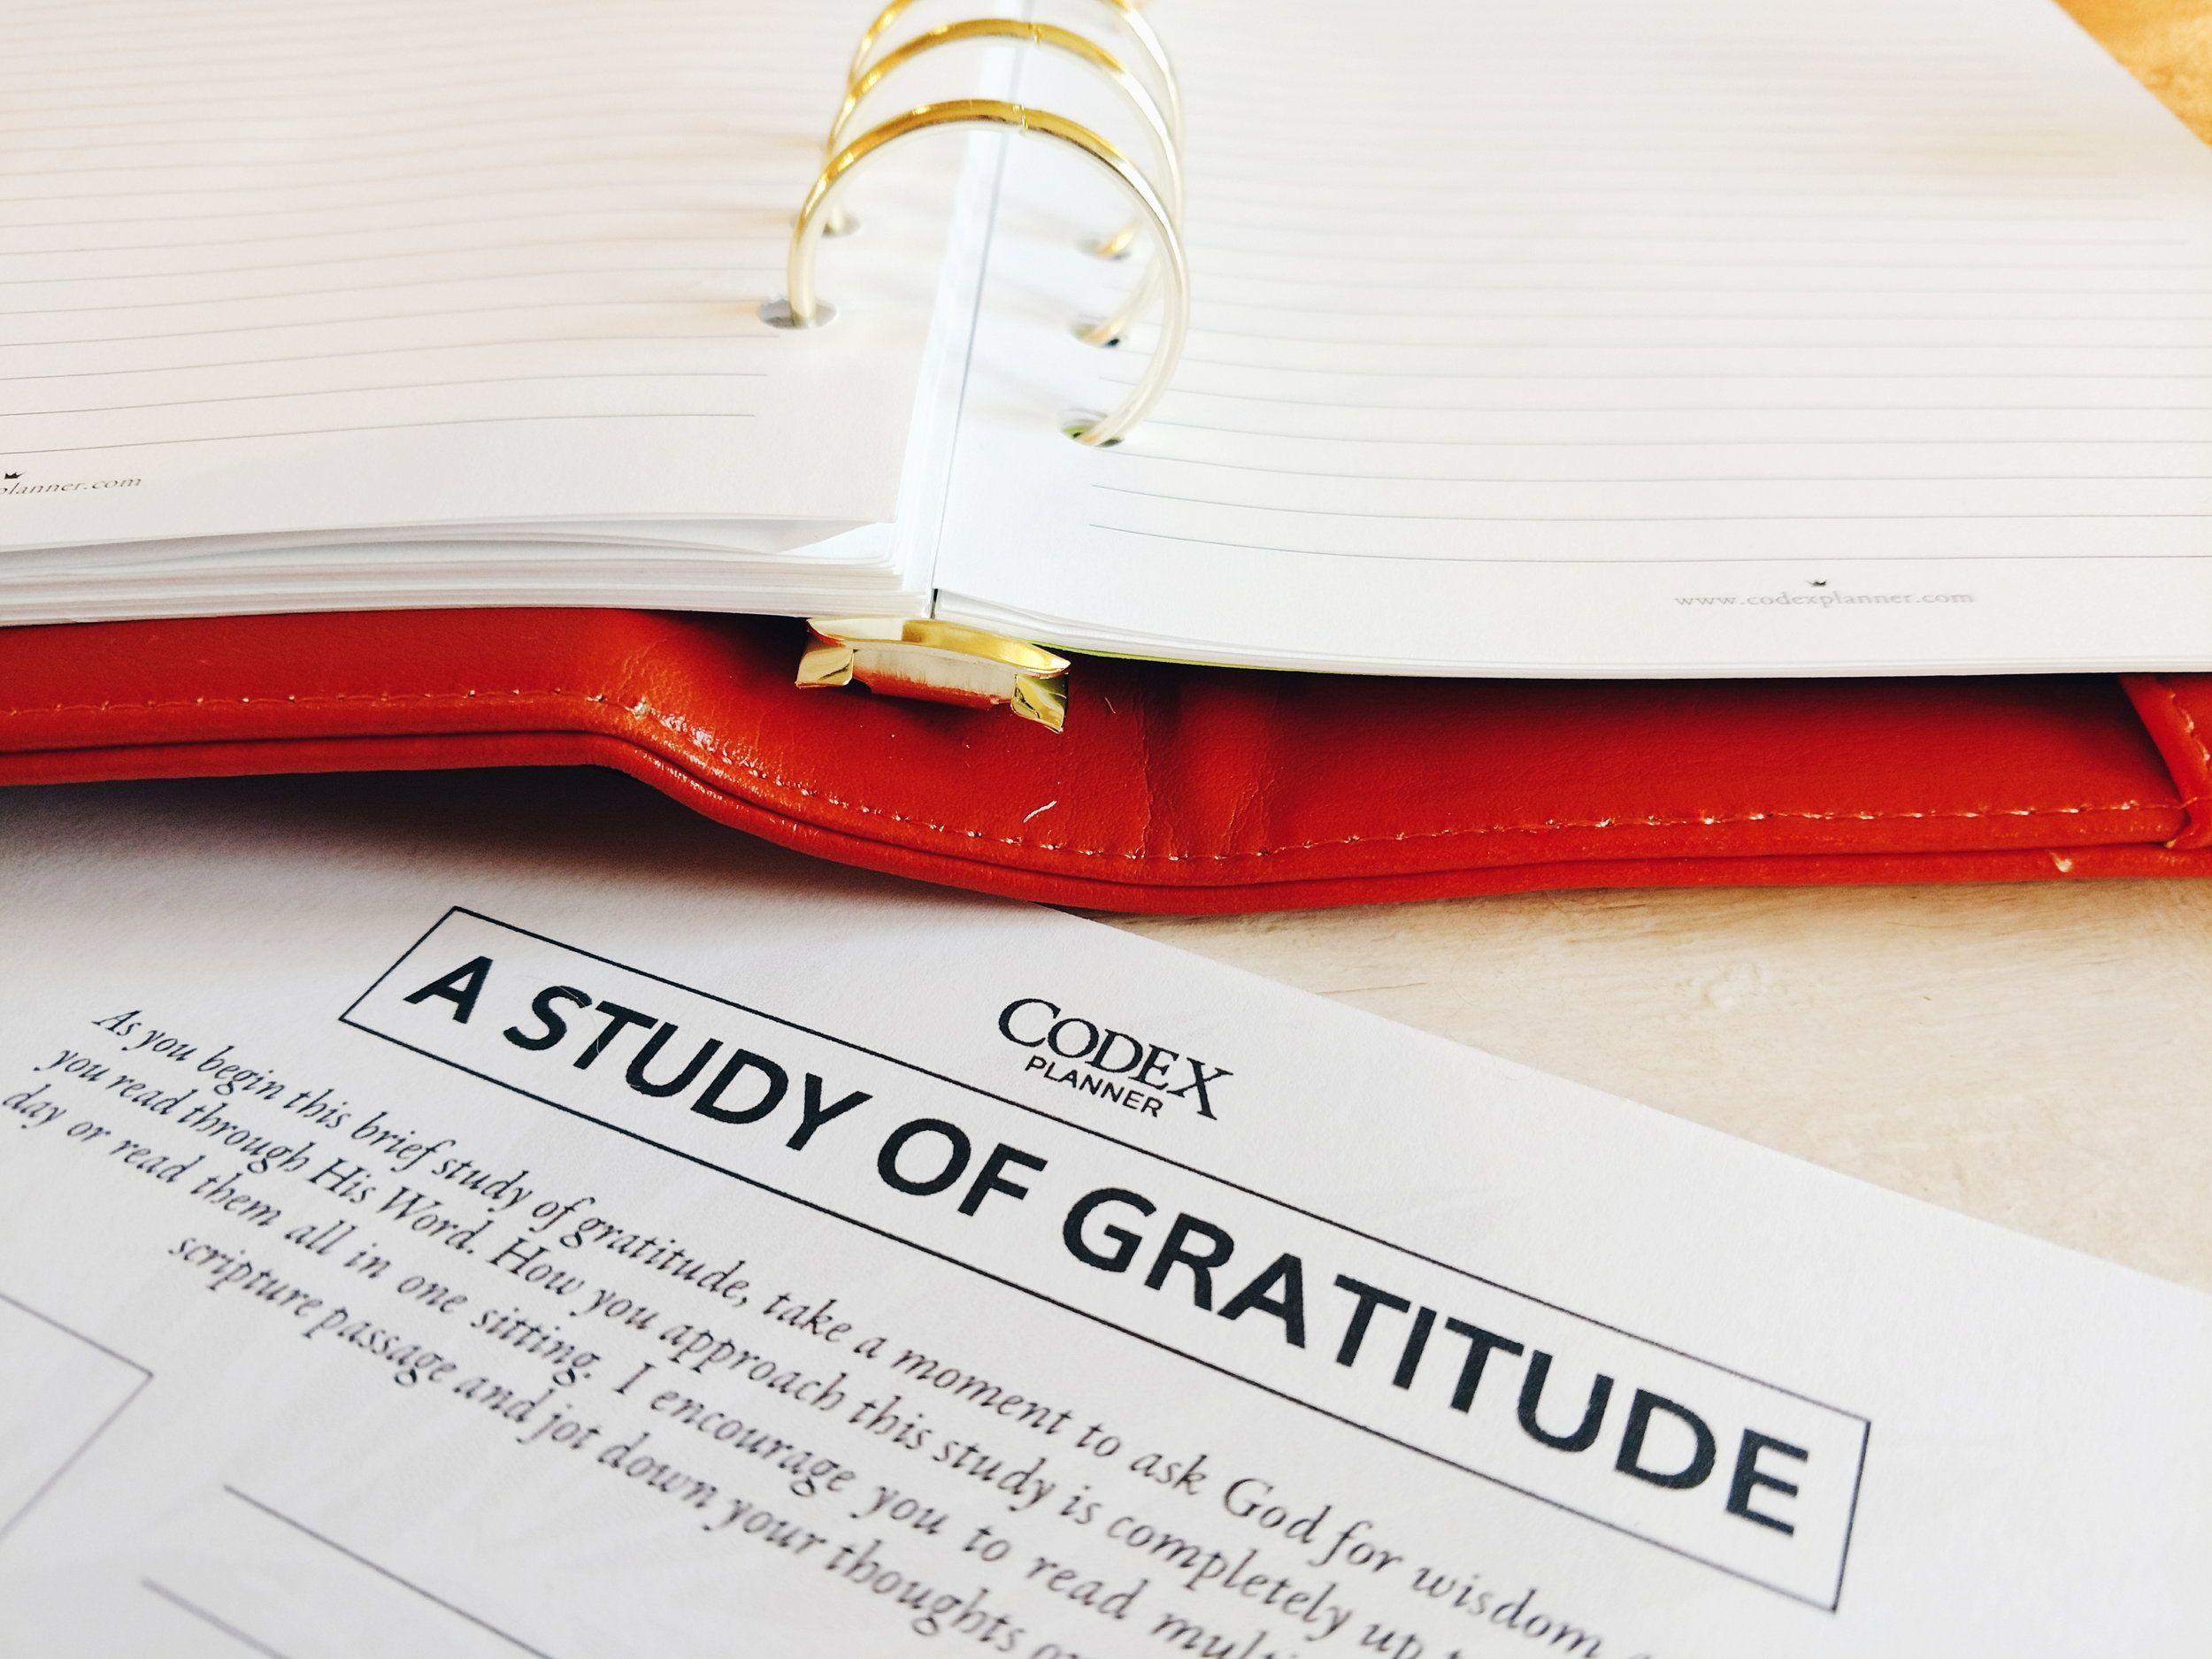 A Study Of Gratitude Worksheet Codexplanner Biblestudy